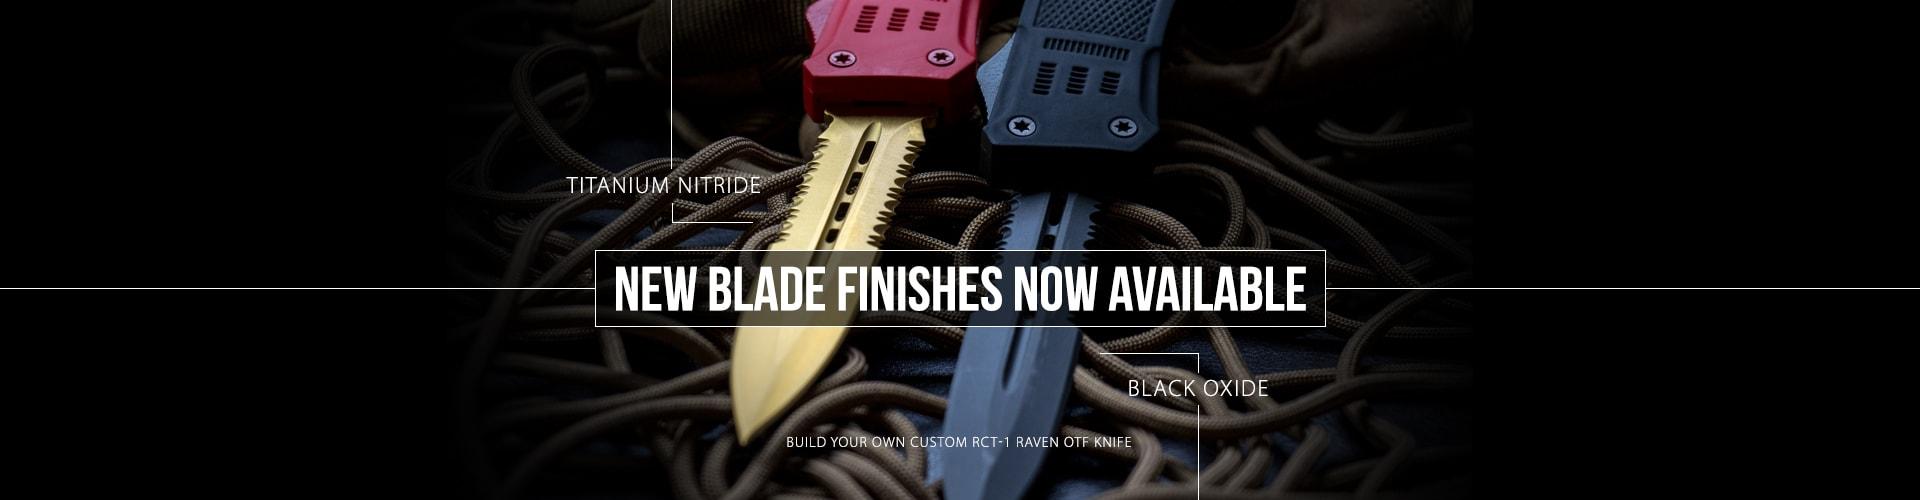 RavenCrest Tactical Black Oxide and Titanium Nitride Blade Finishes